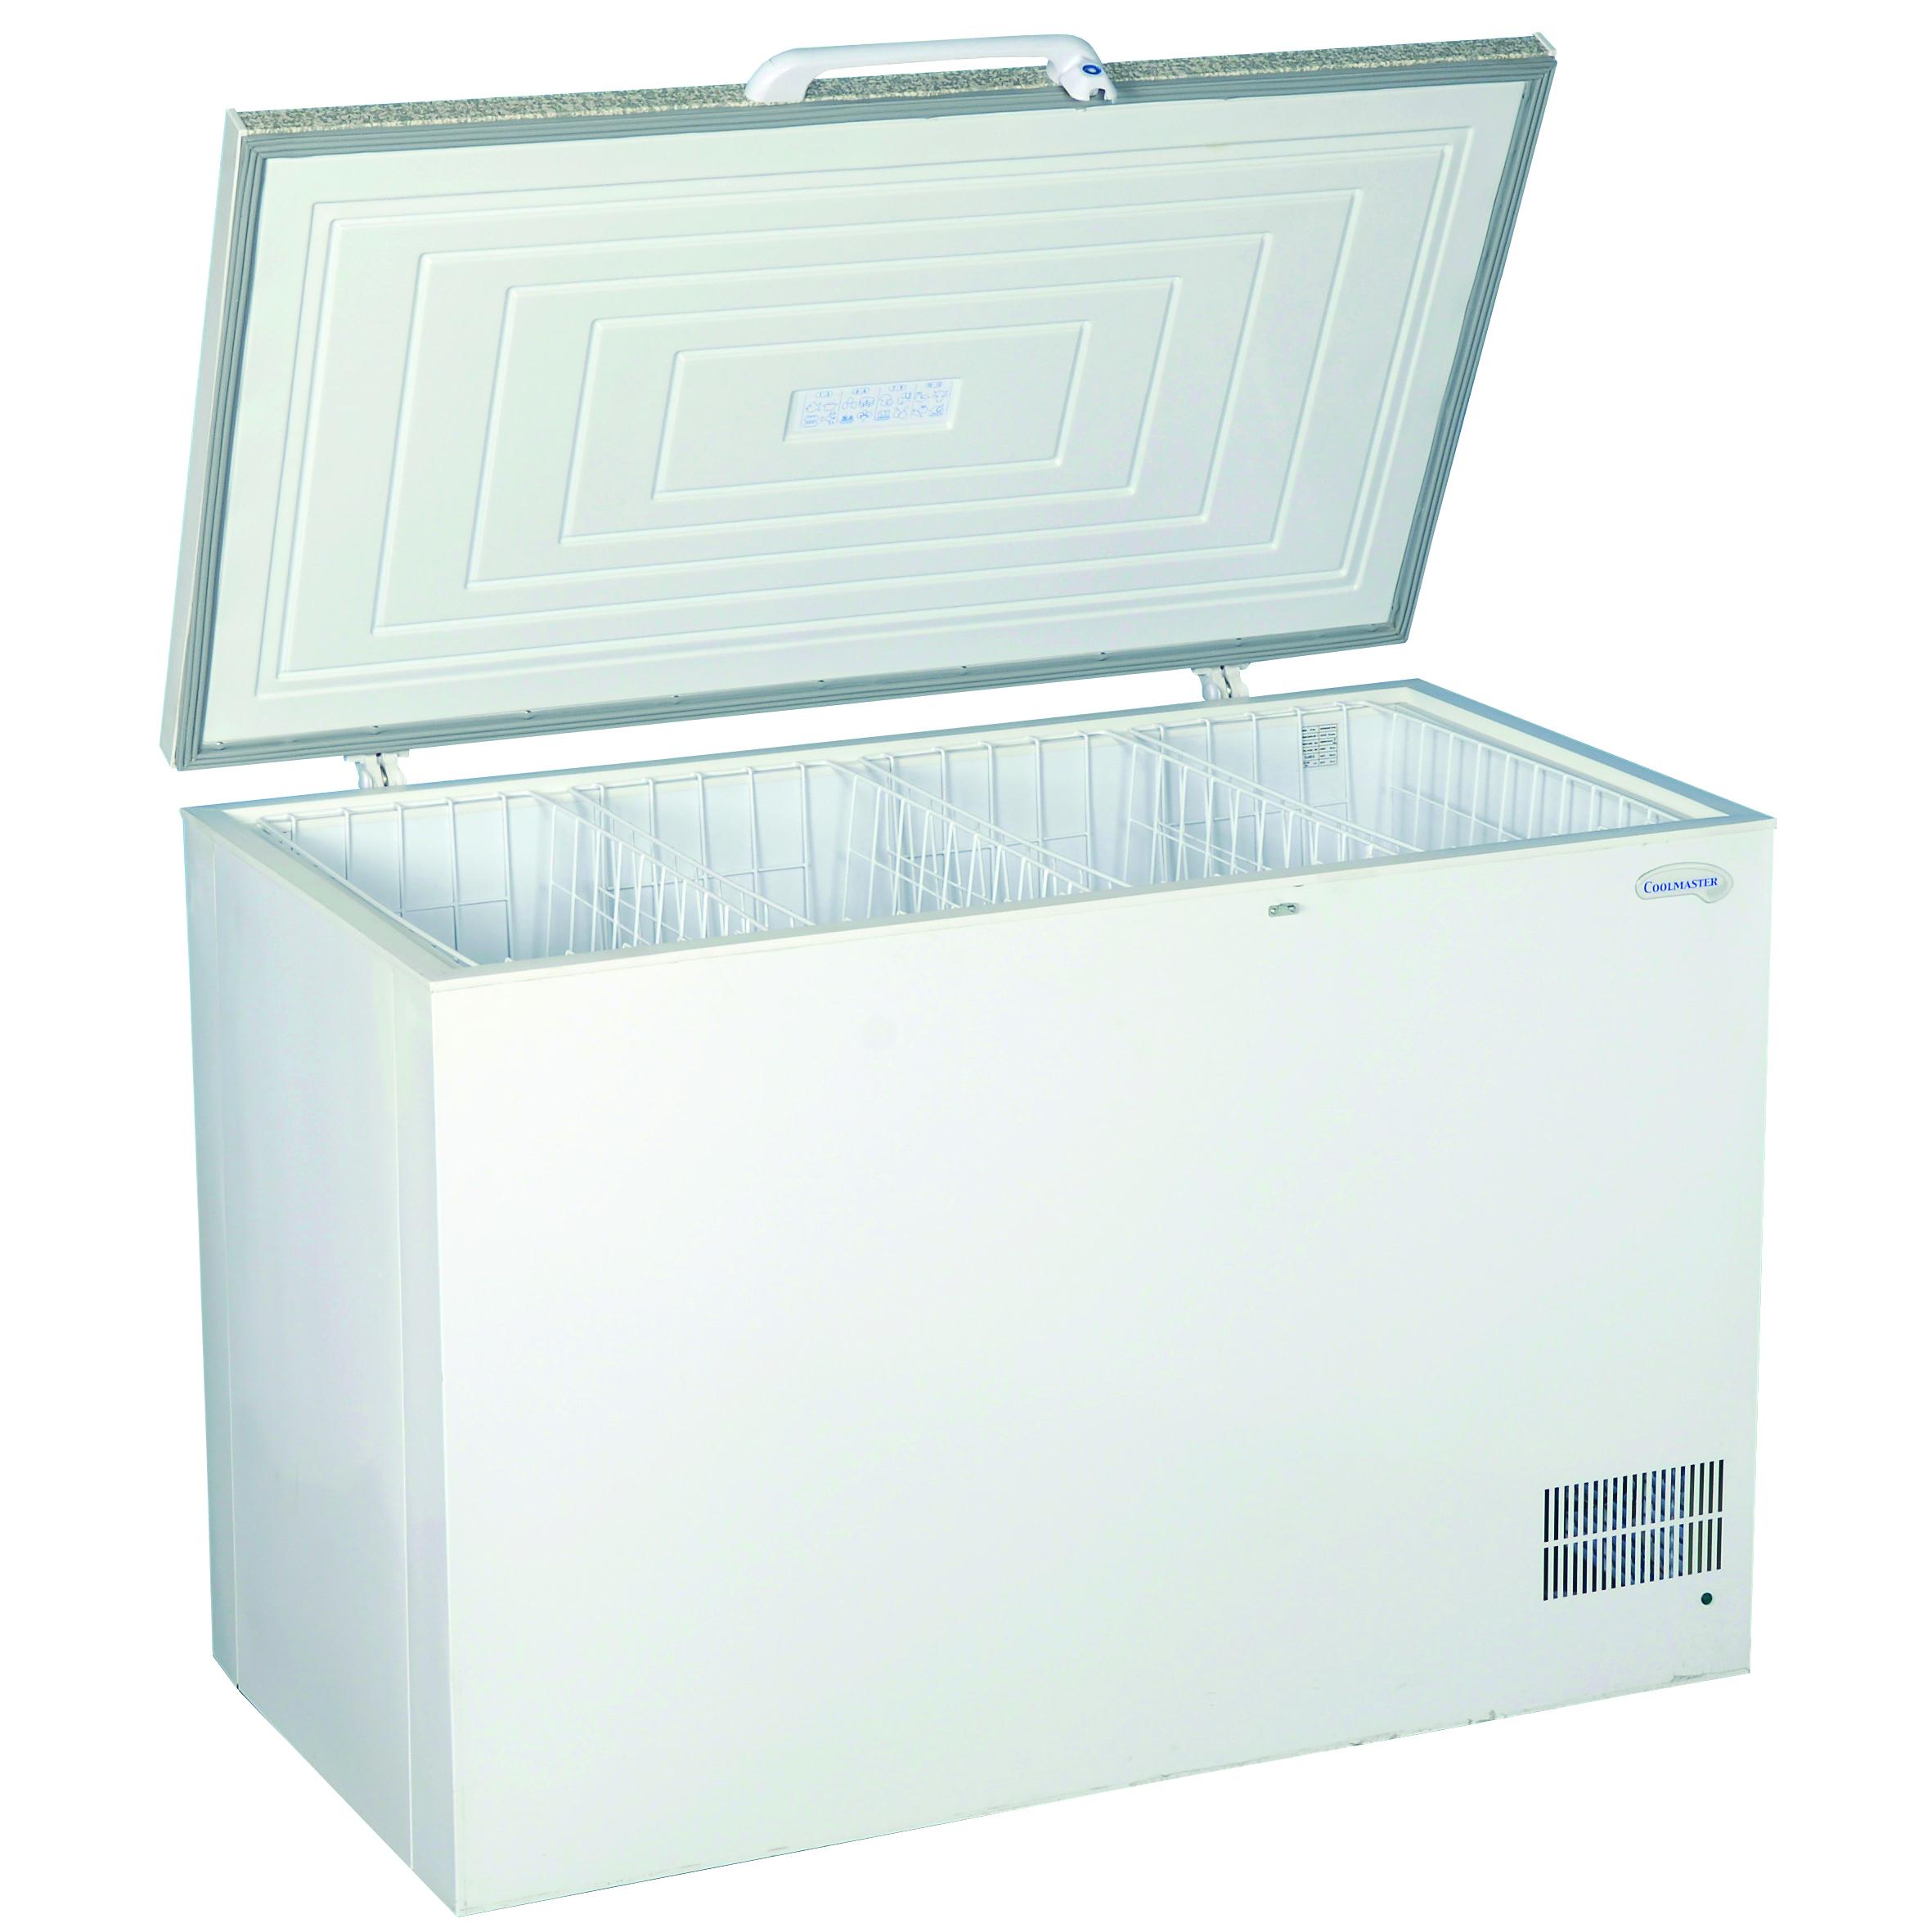 Fridge Star 433lt Chest Freezer Direct Cooling